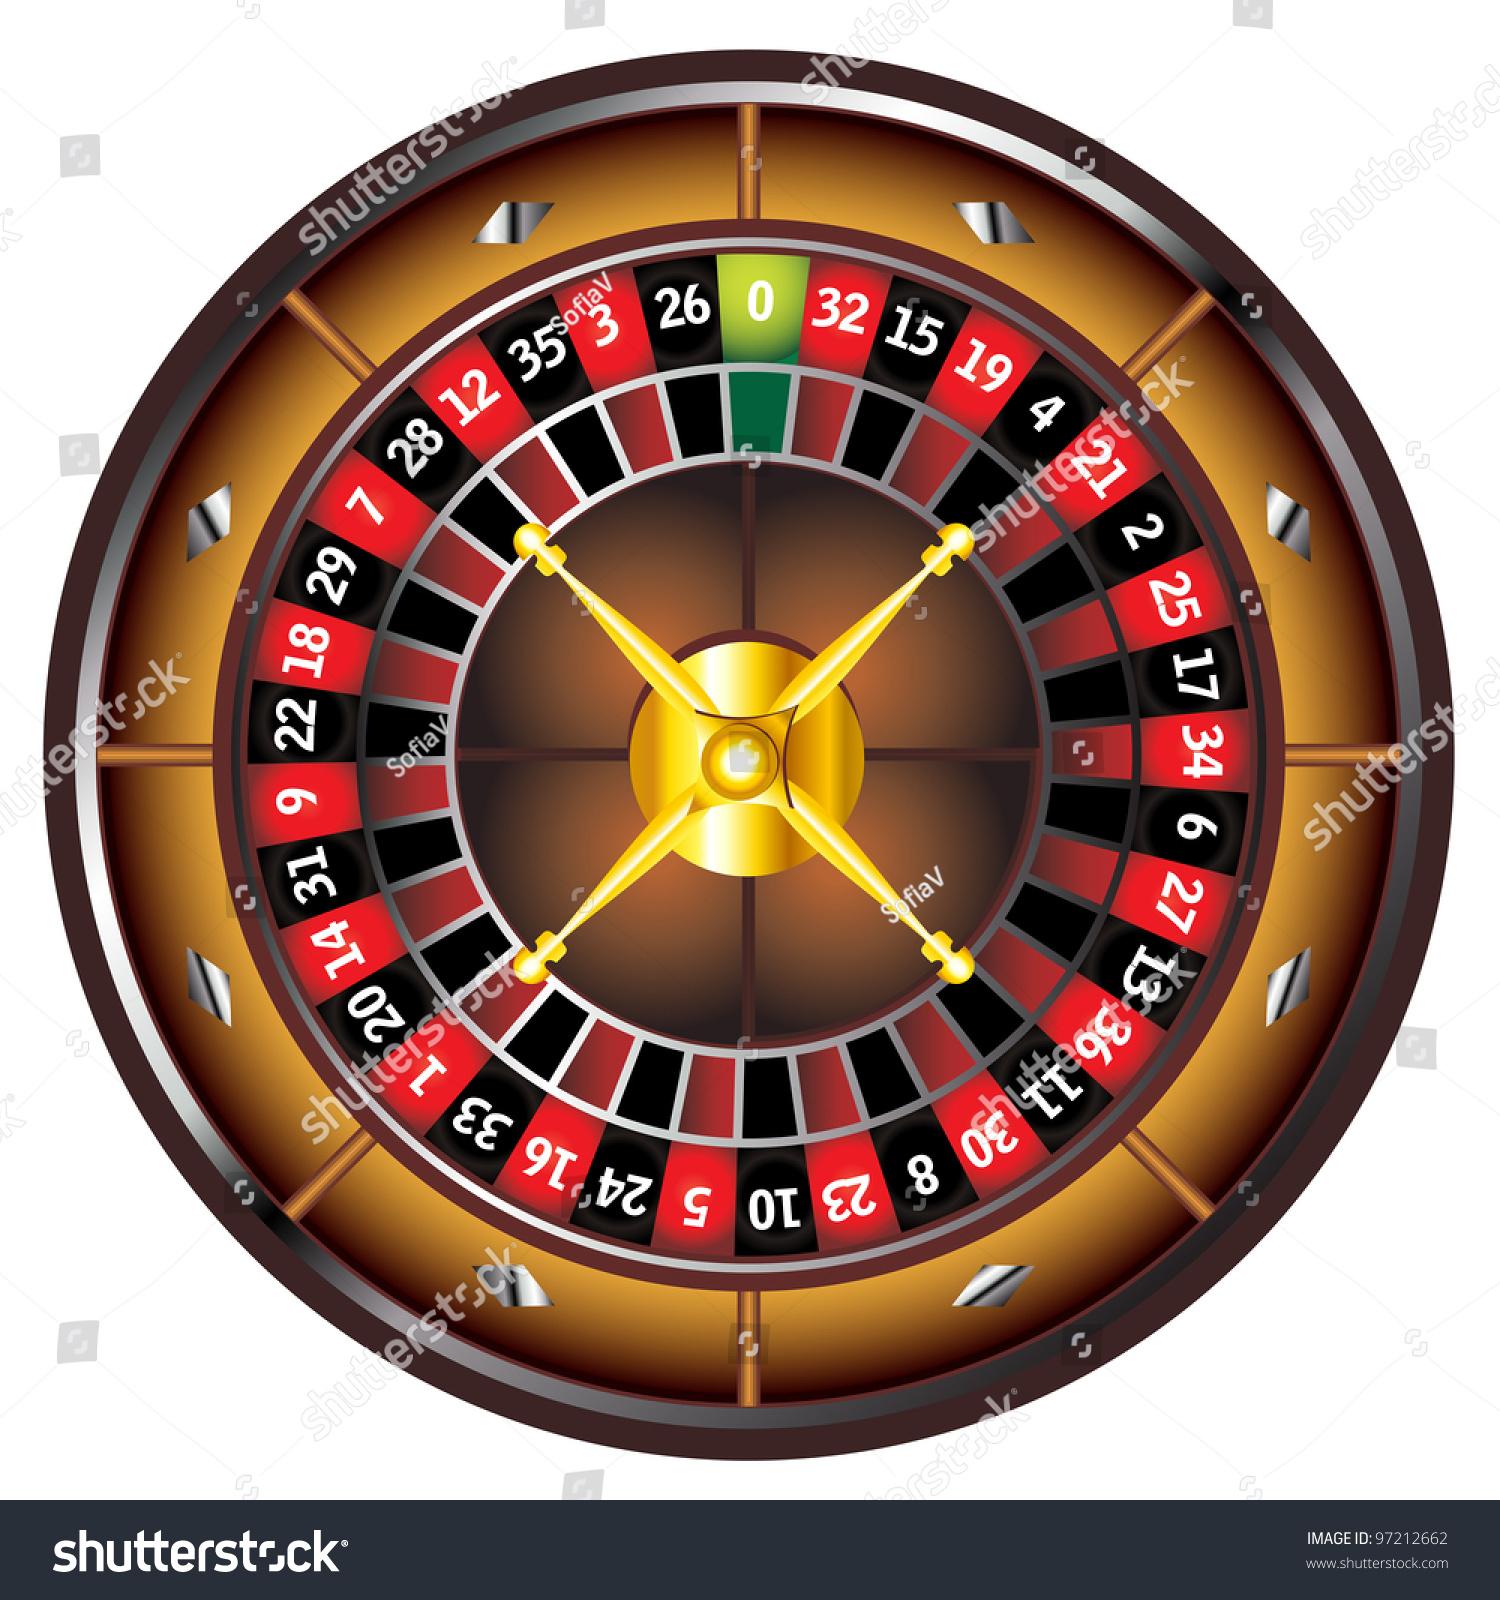 online slot machines casino european roulette